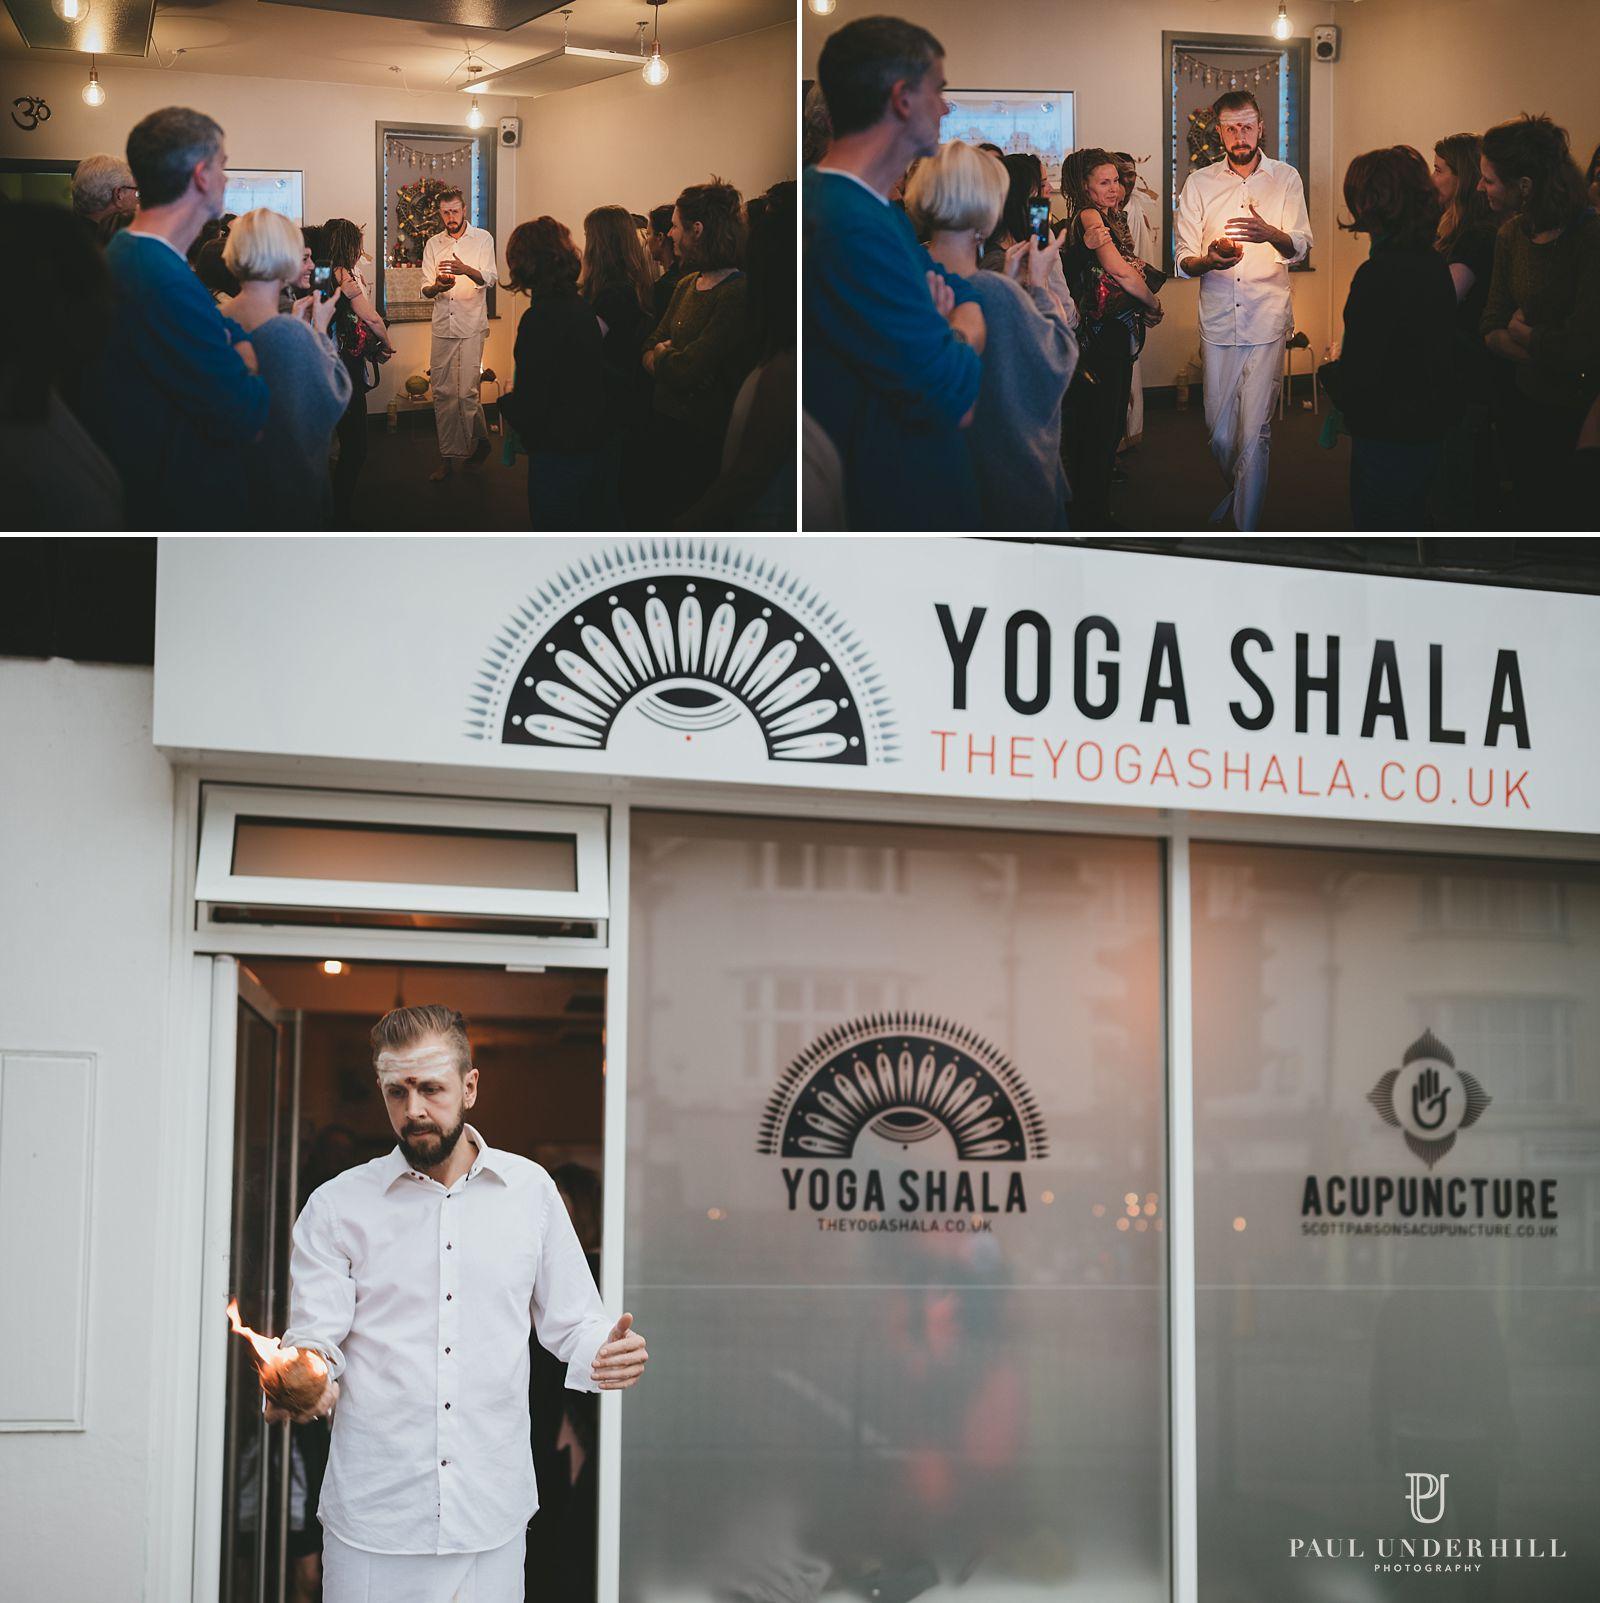 Photography of Yoga Shala event